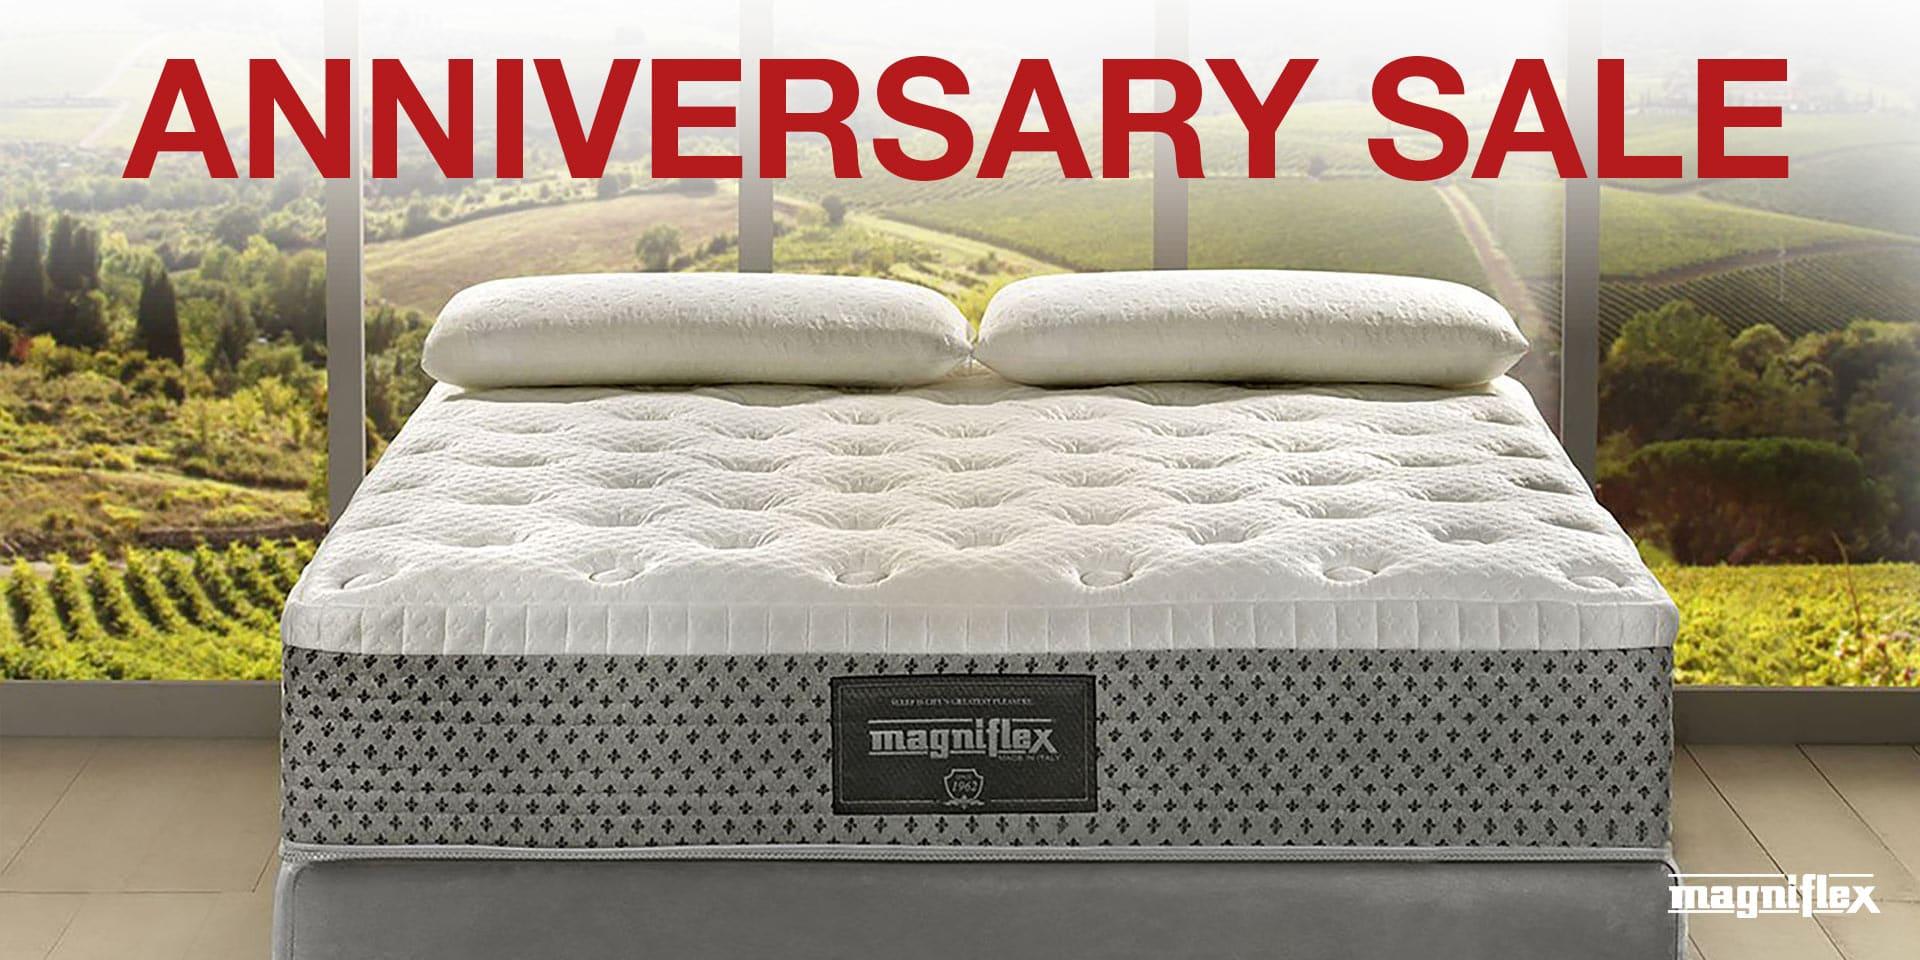 Anniversary Magniflex Sale